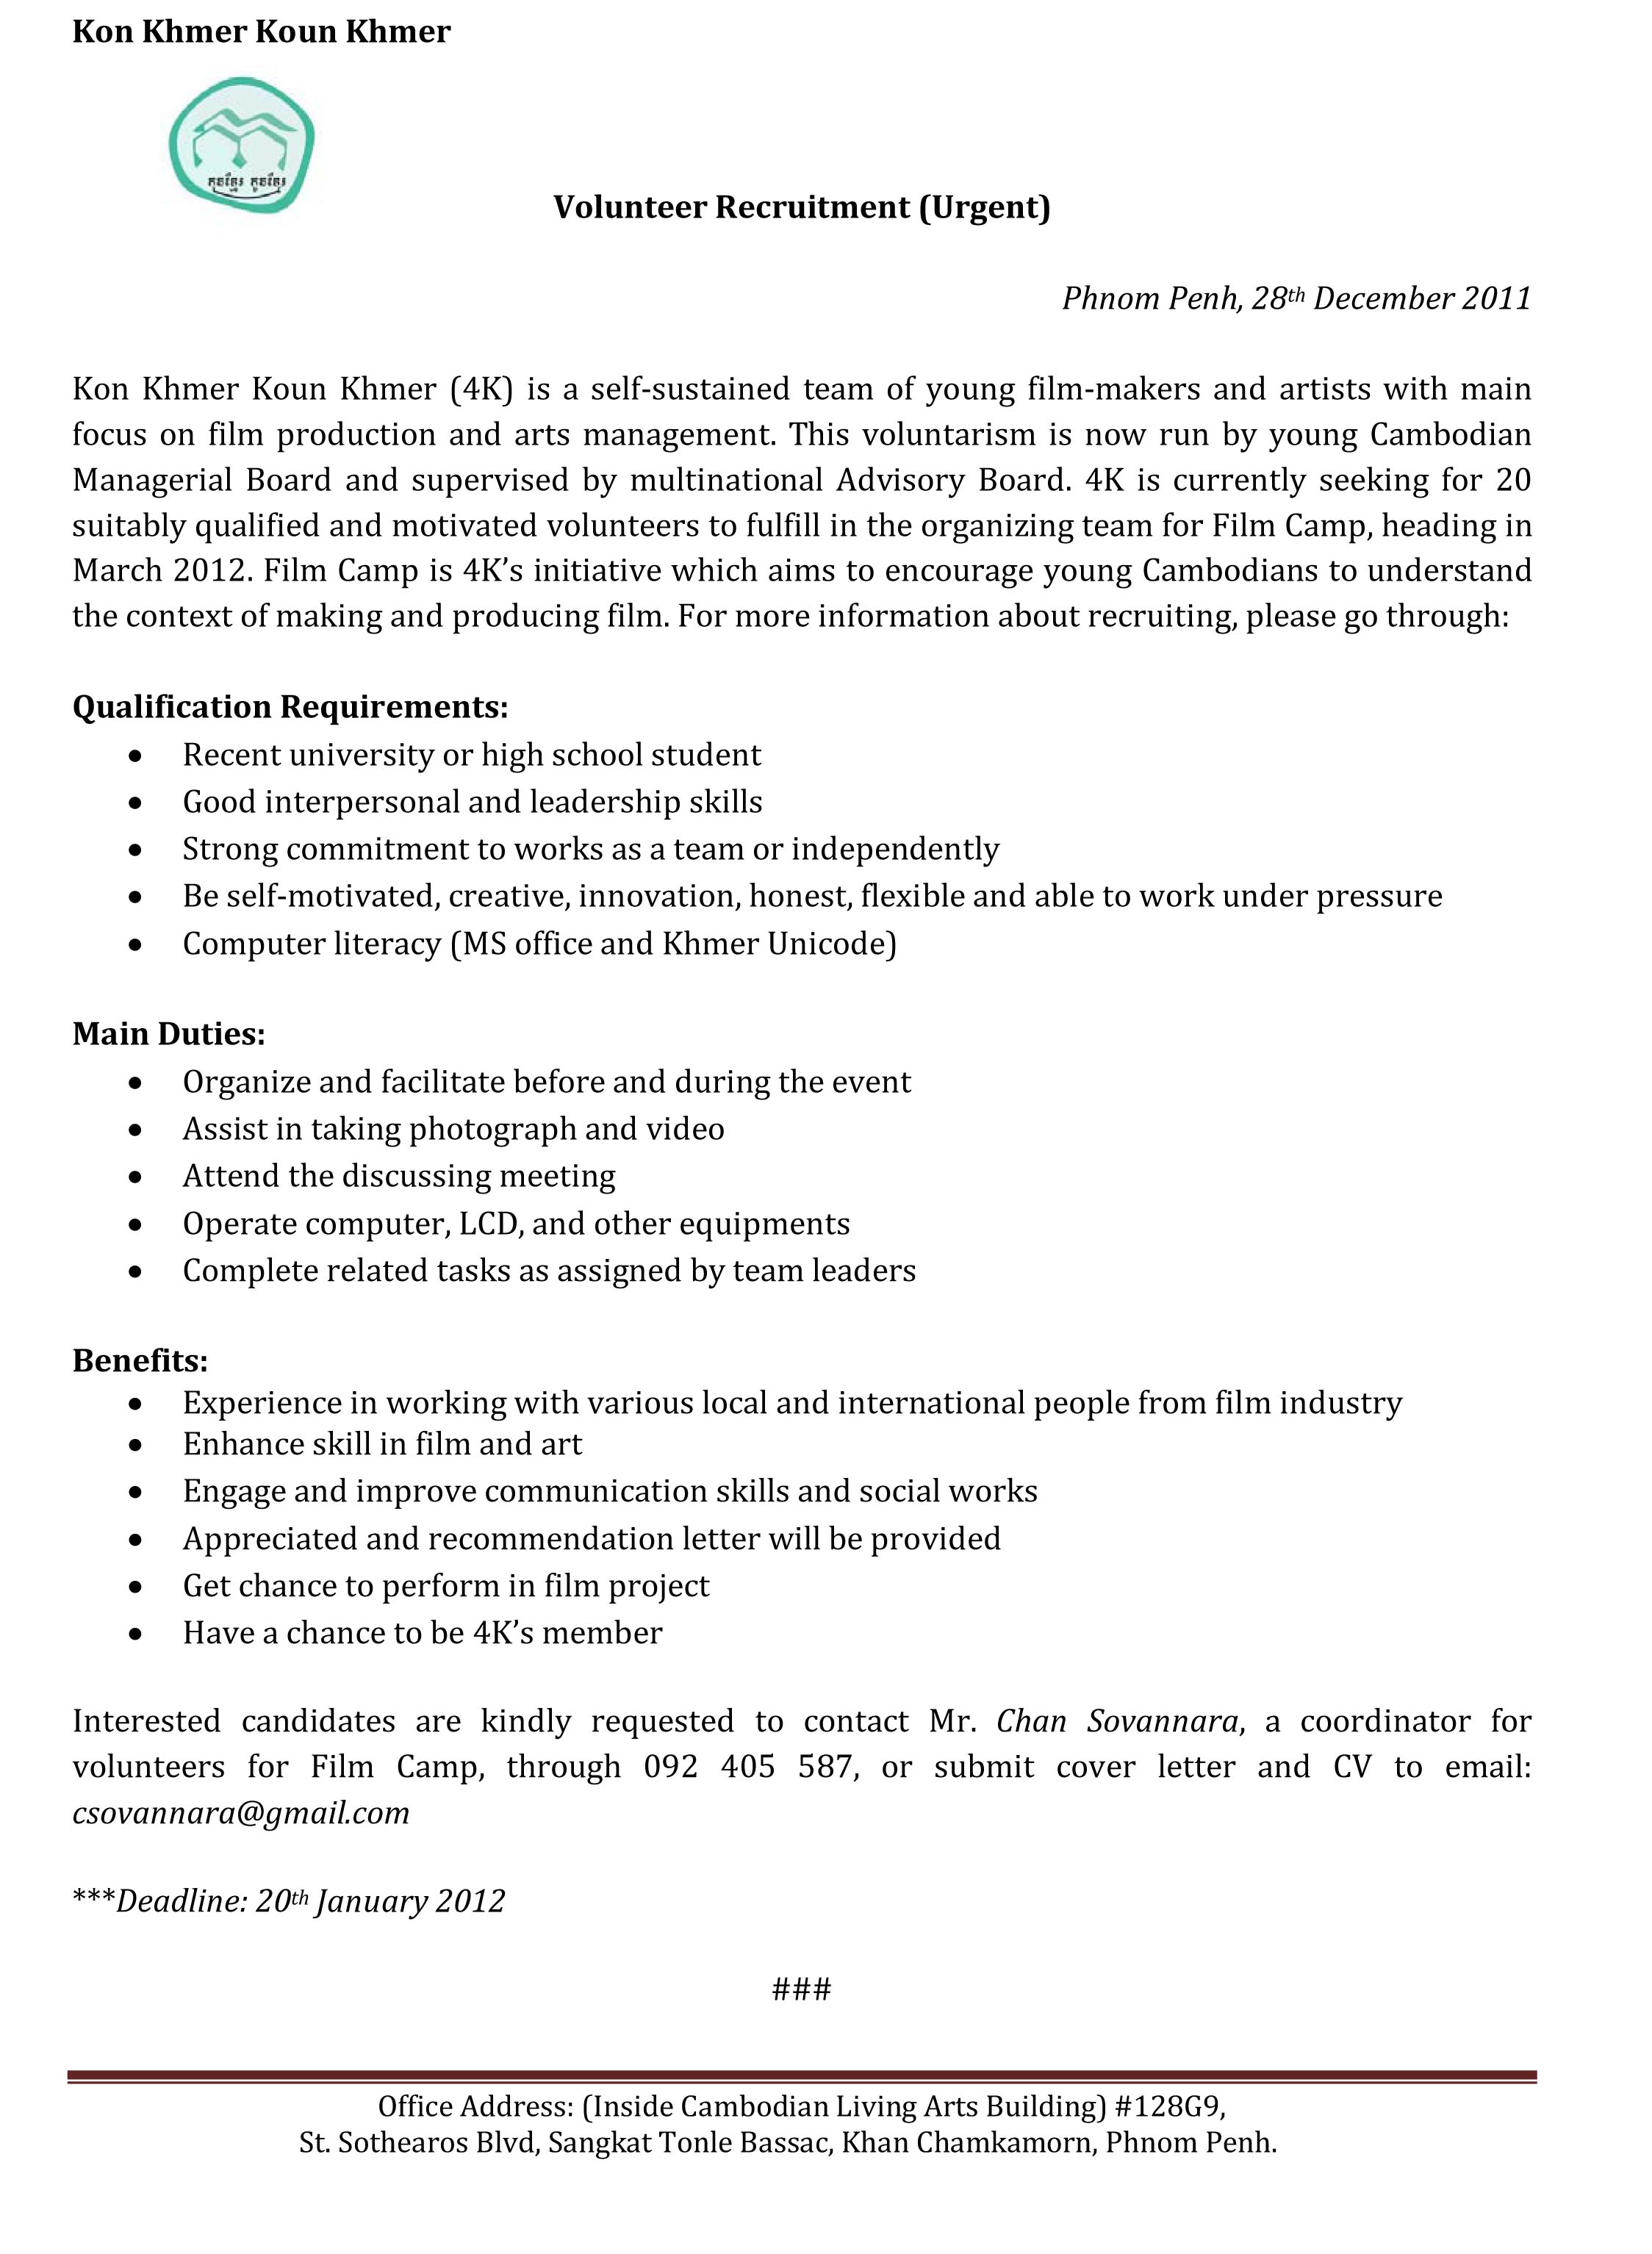 Volunteer Coordinator Resume Examples - Resume Examples ...